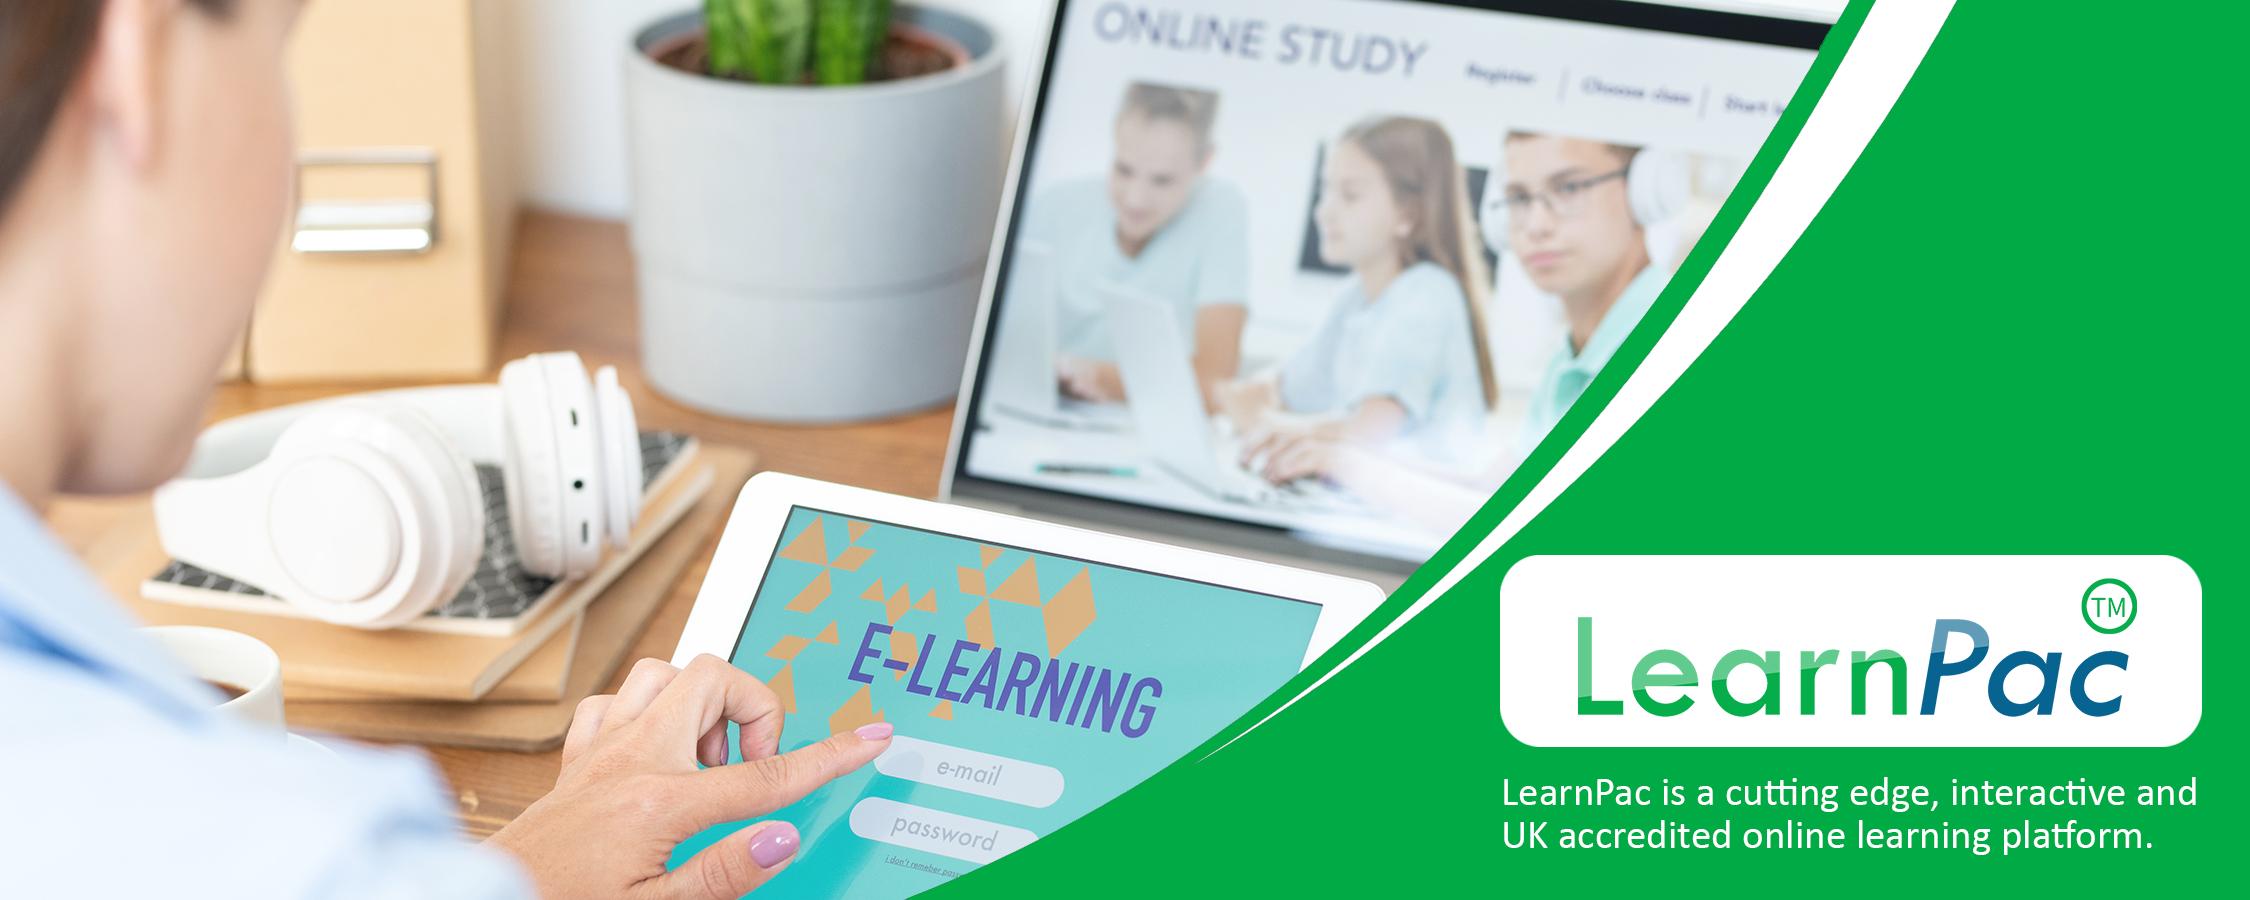 Verification of Death Training for Nurses - Online Learning Courses - E-Learning Courses - LearnPac Systems UK -